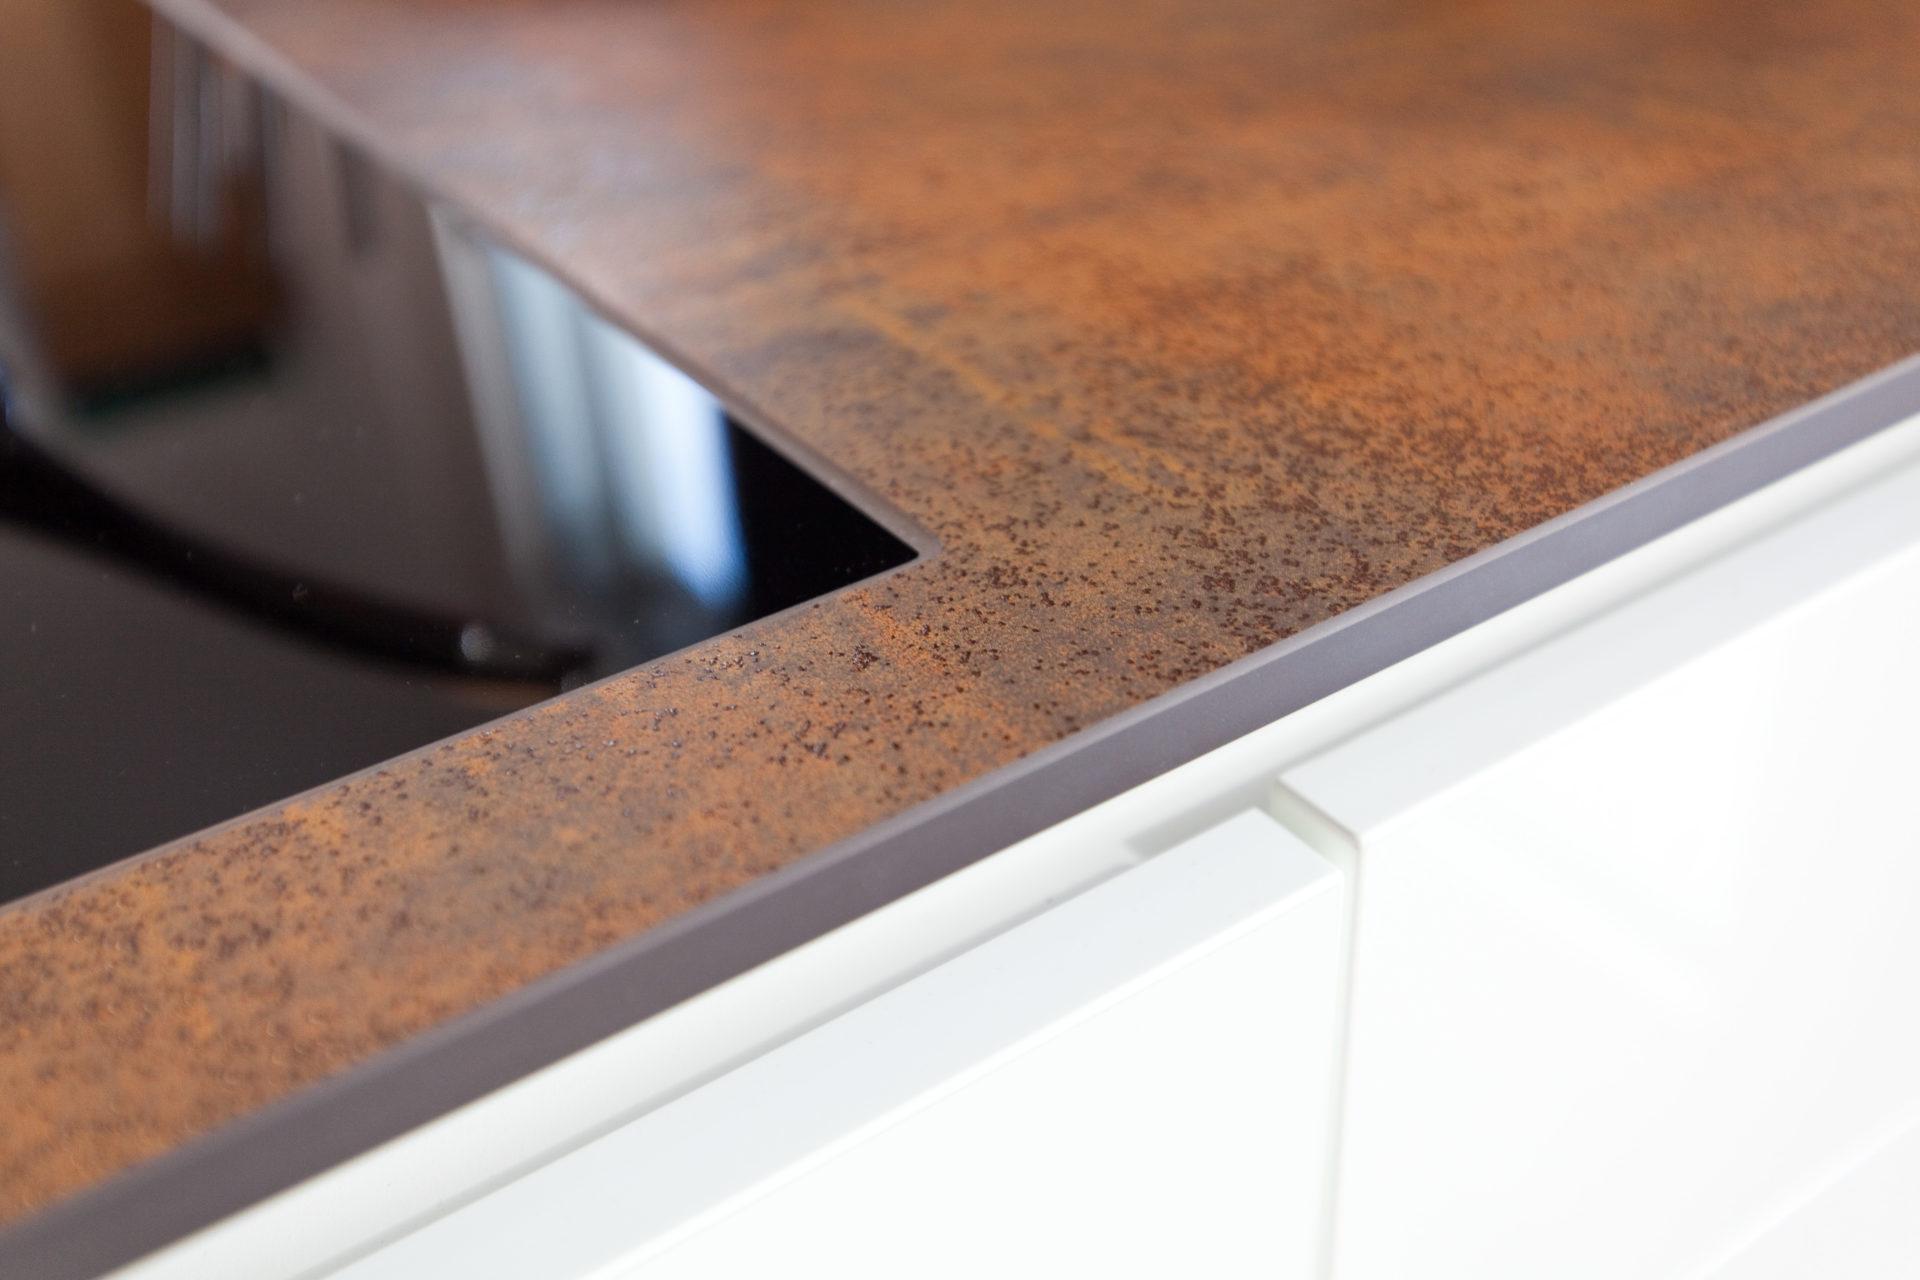 Kueche Overath Weiss Granit Modern Grifflos Bora Miele 056